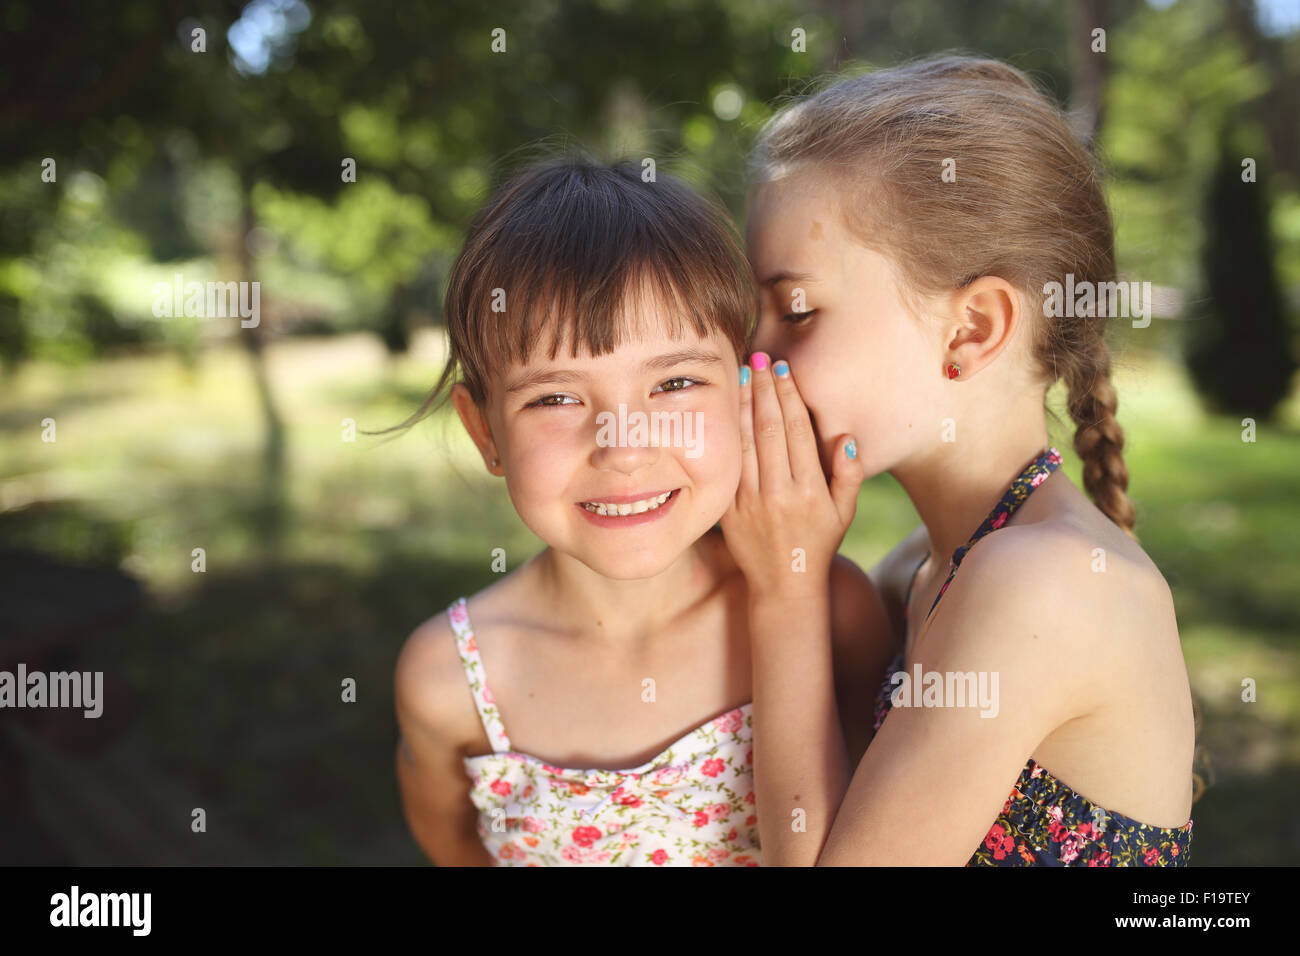 little secrets - Stock Image